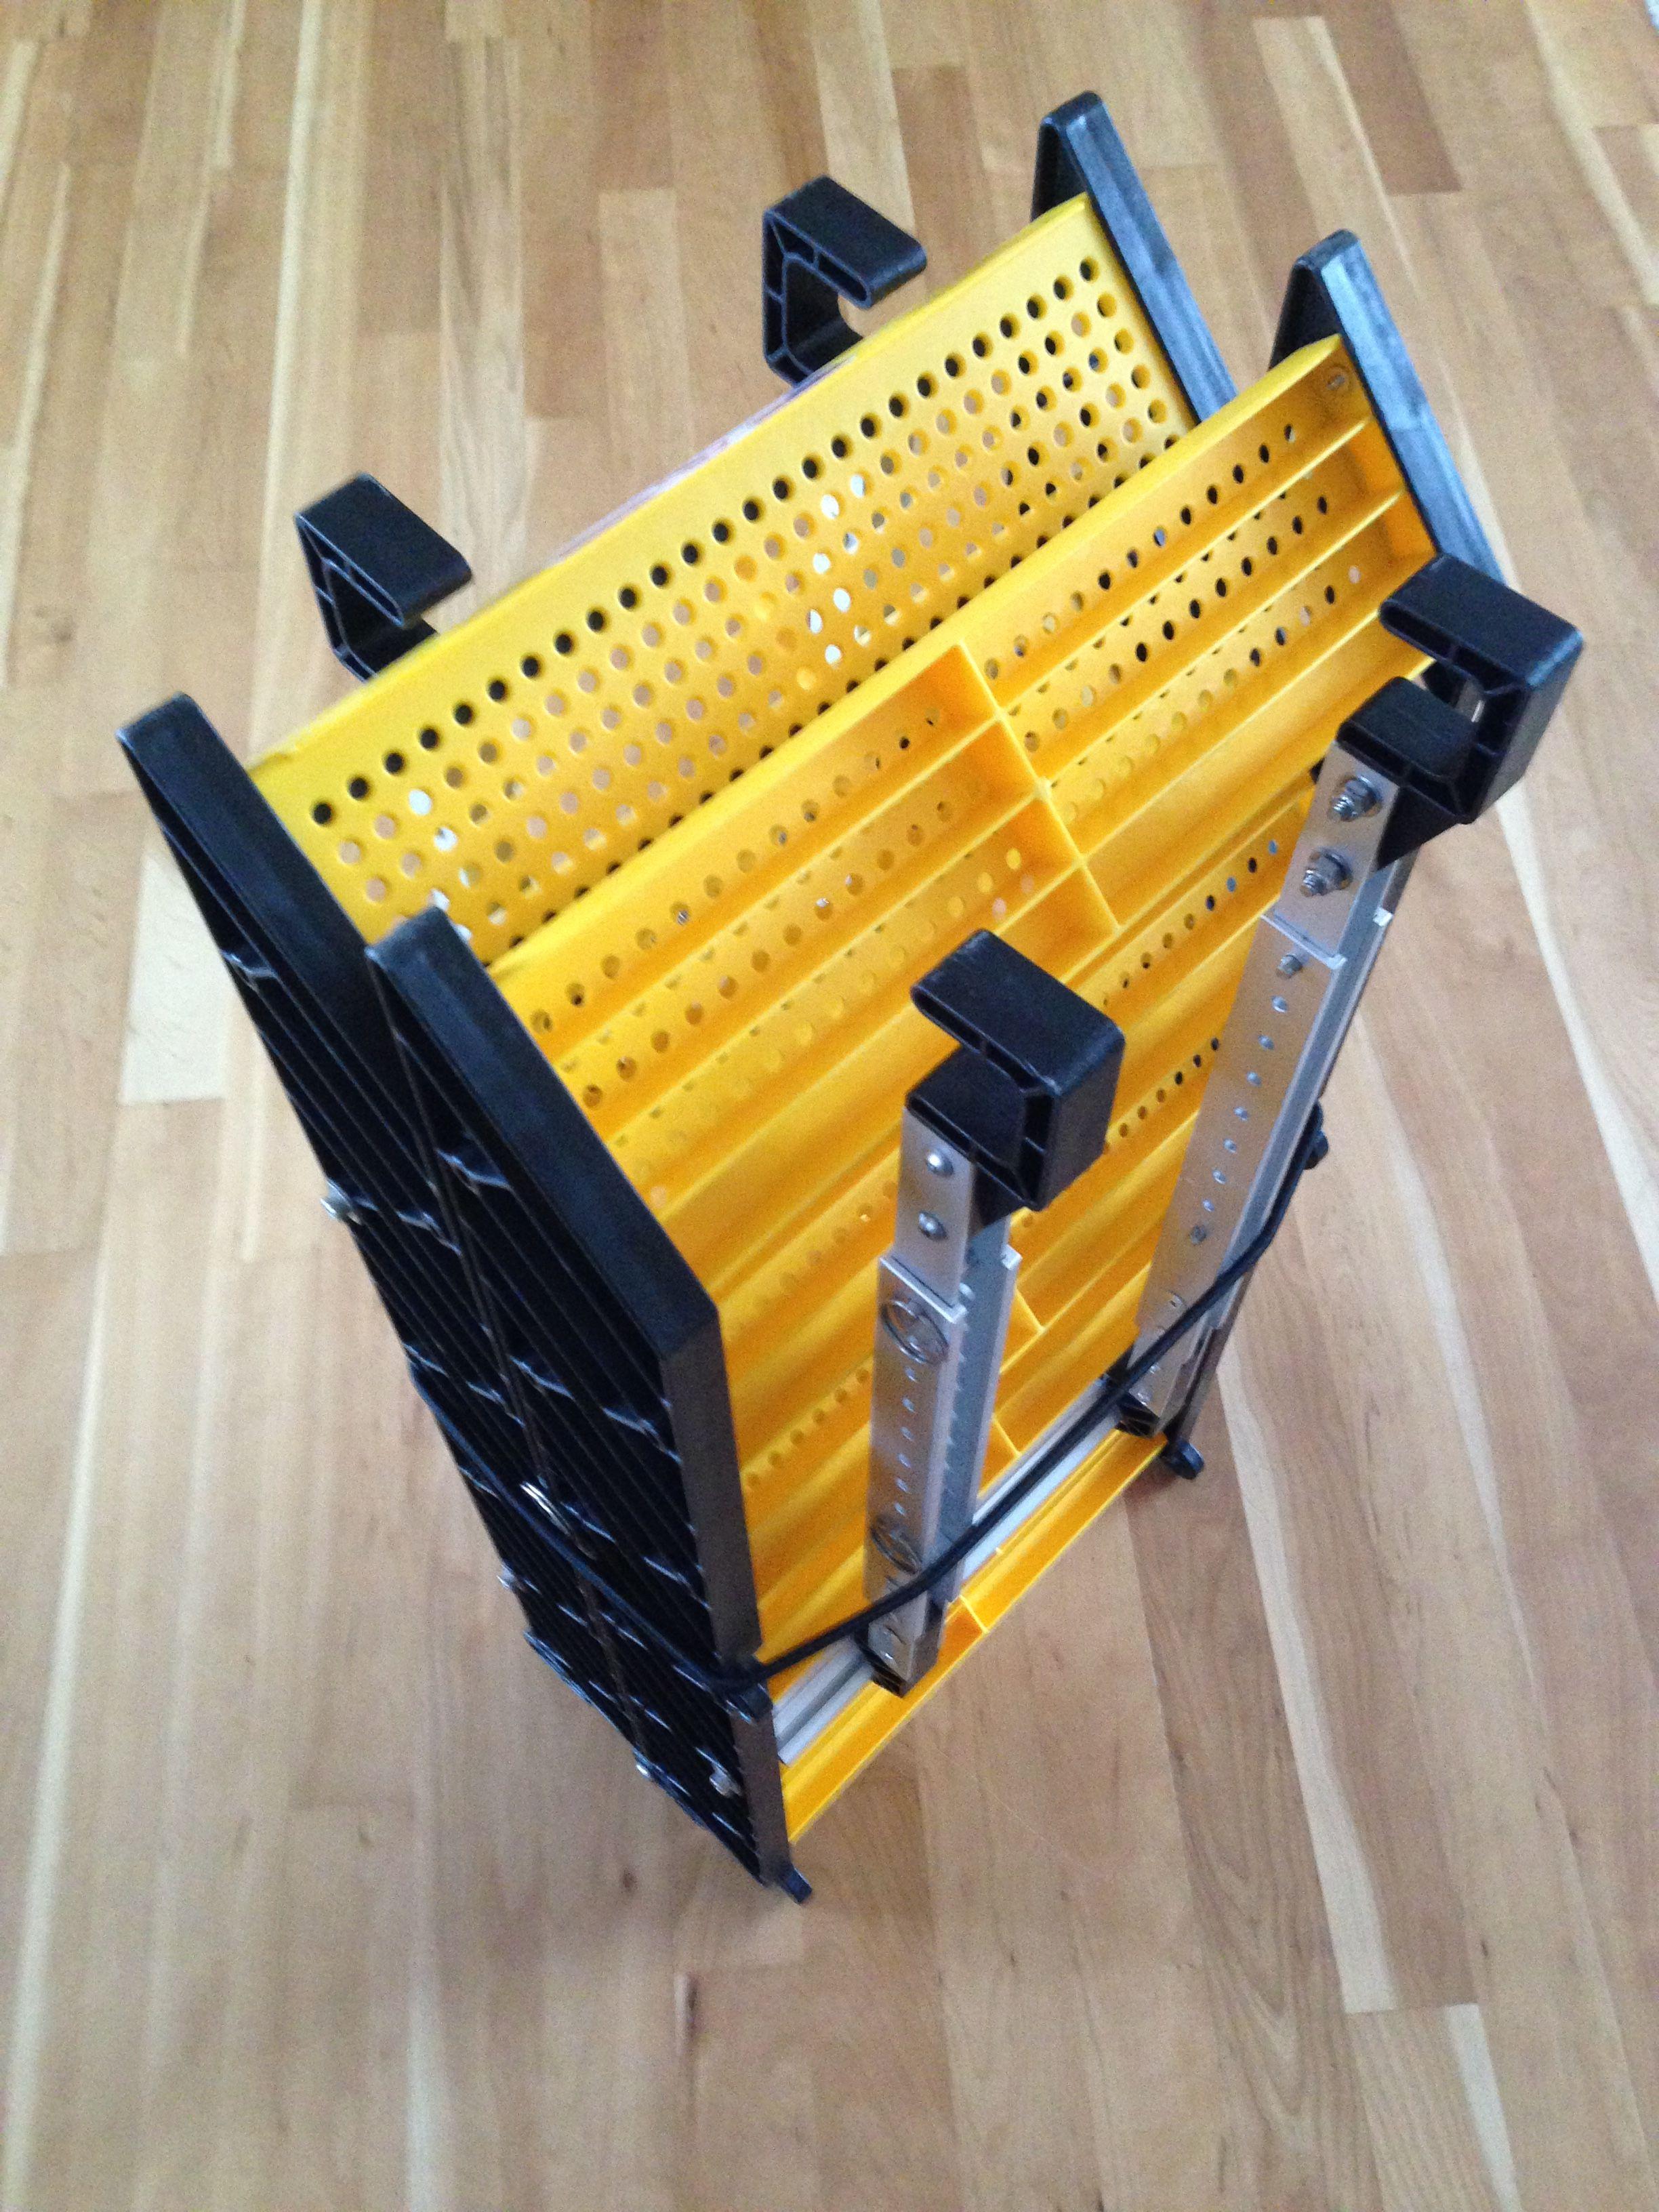 WAG Boarding Steps™ Model SLM-12 Folded for Transport